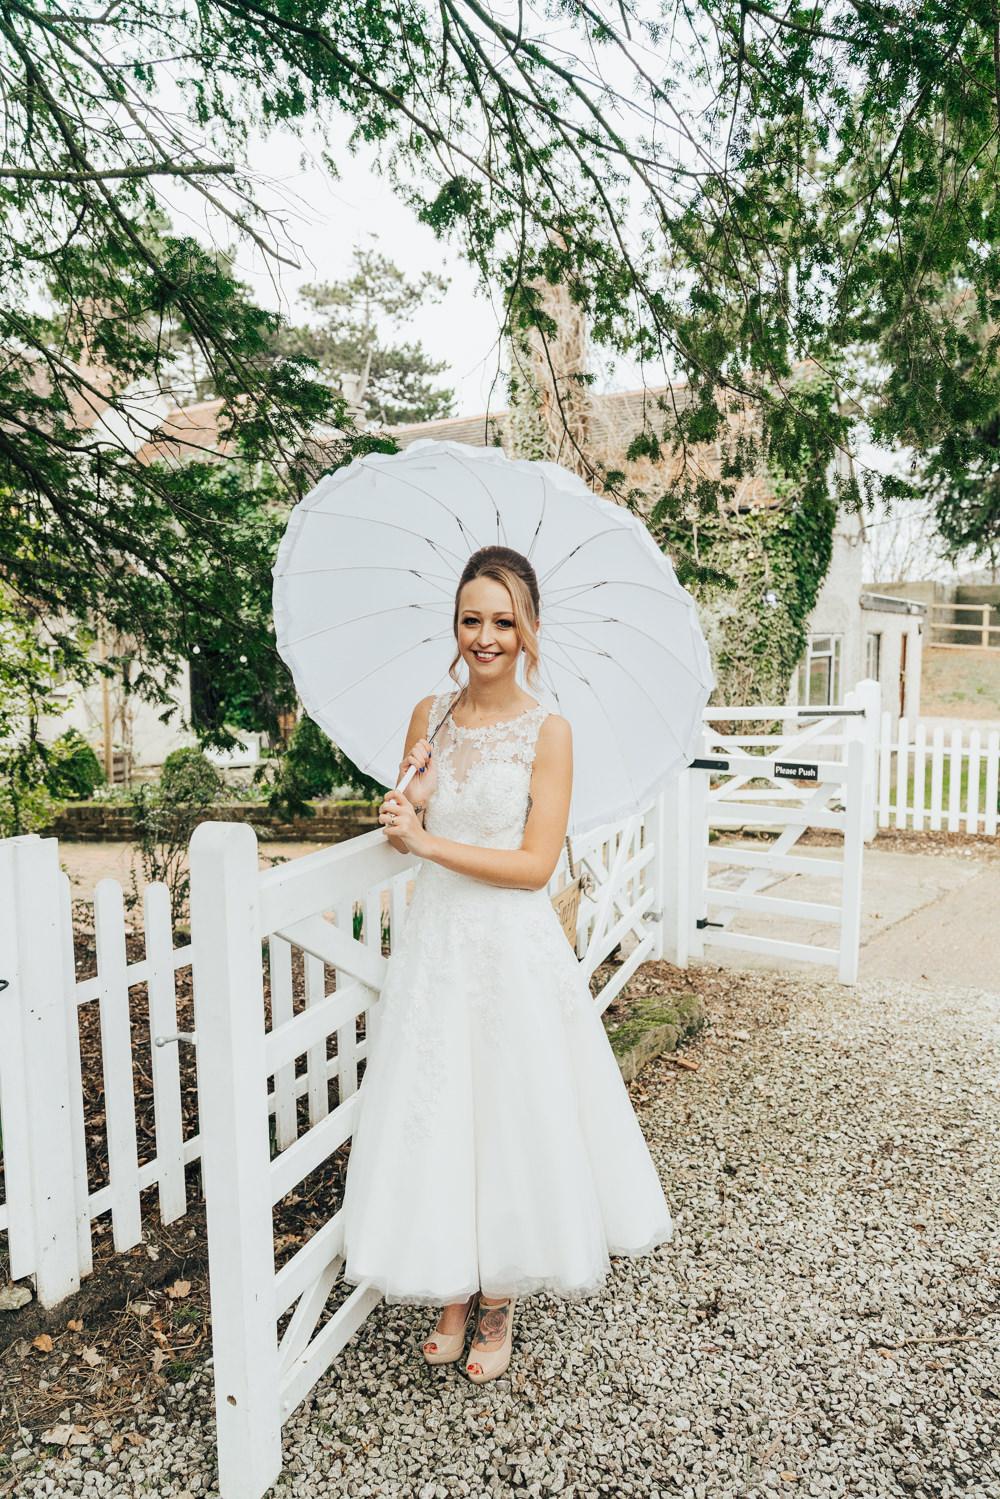 Short Dress Bride Bridal Tea Length Gown Parasol Umbrella Hoop Wedding Ideas Rebecca Carpenter Photography